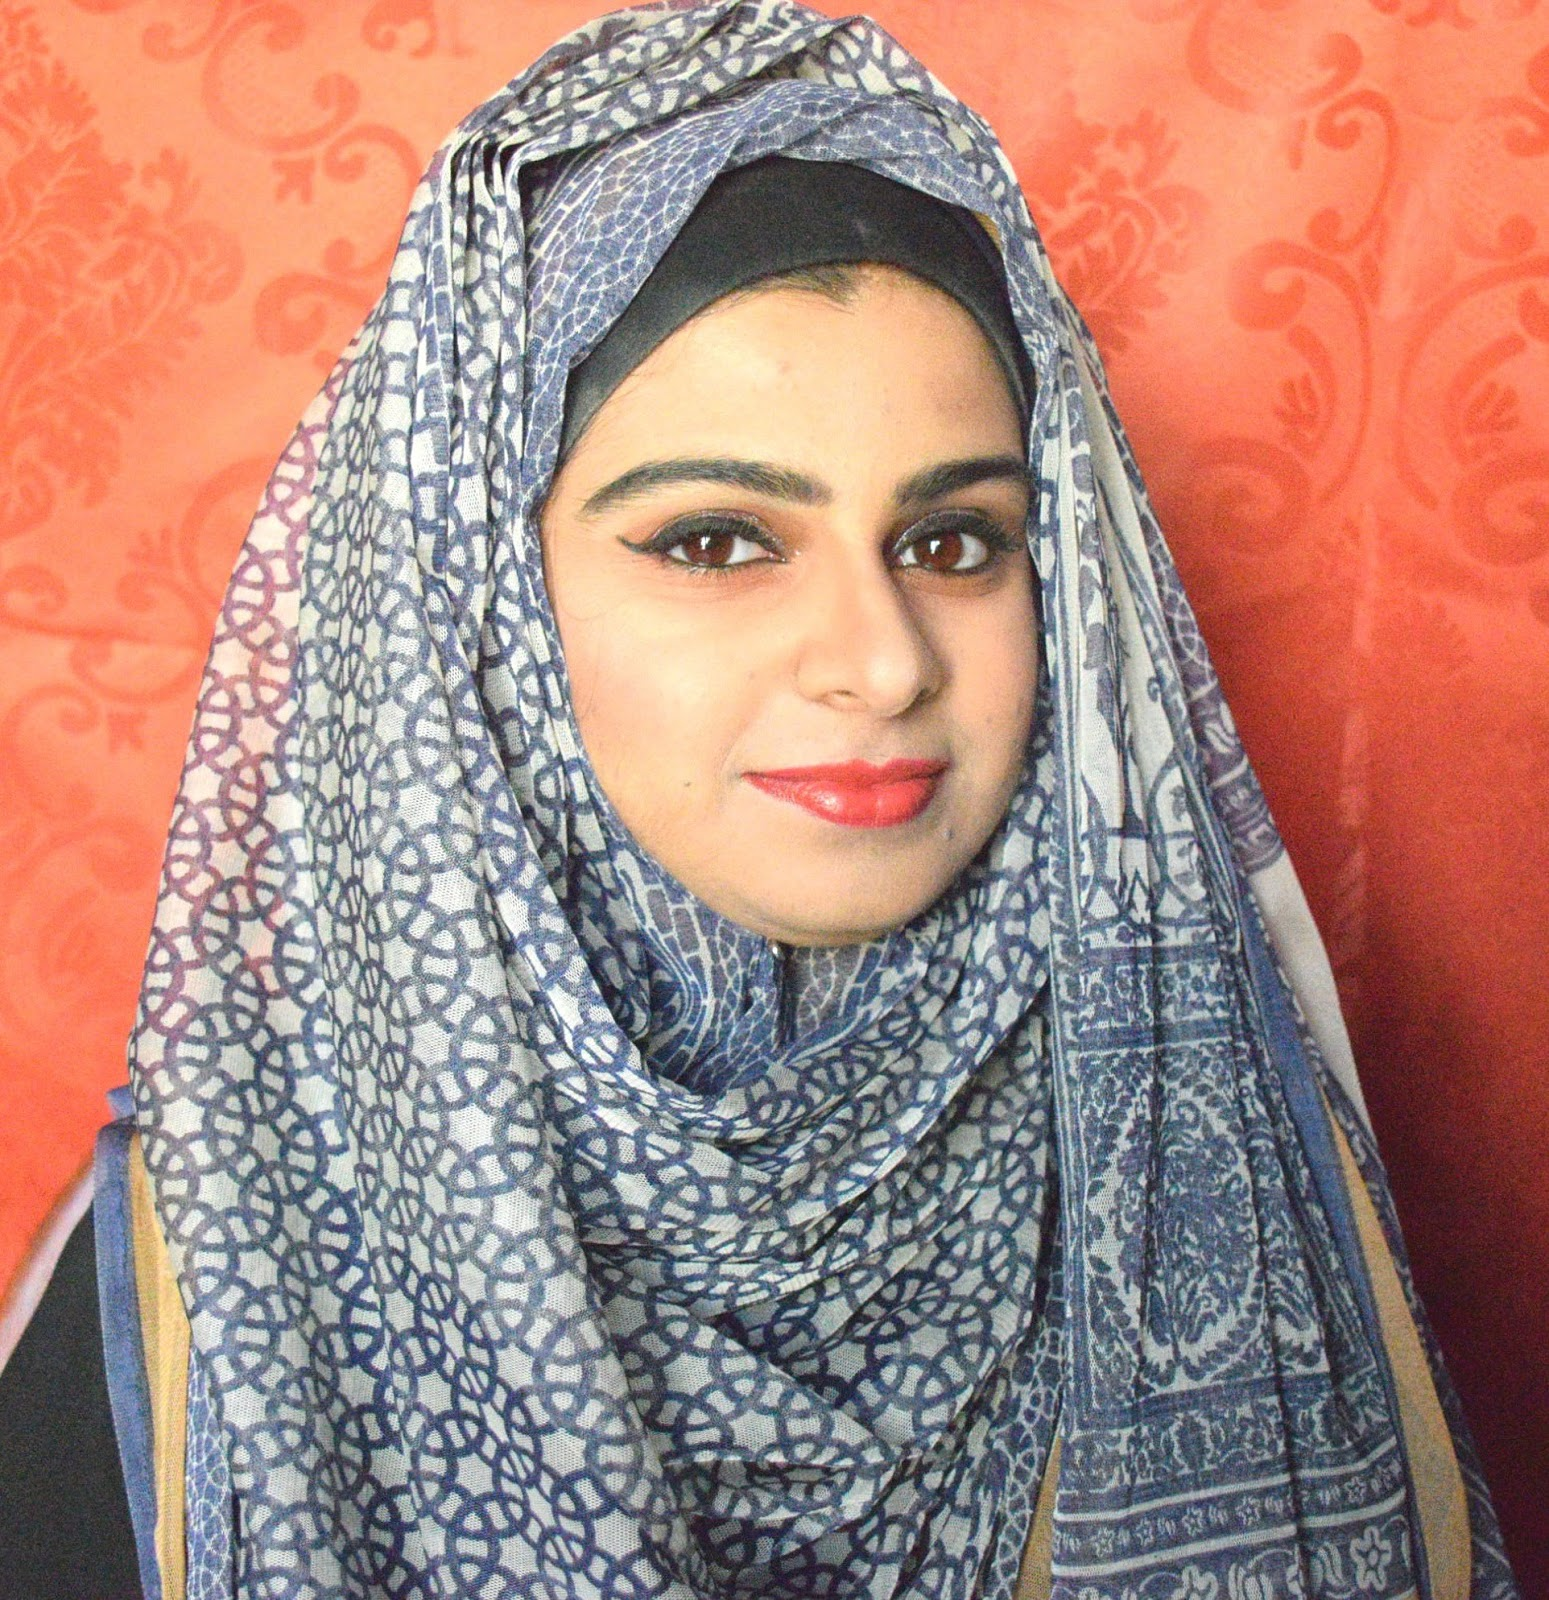 16 Contoh Baju Muslim Hijab Gaul Terbaru 2018 Tren Dunia Hijab